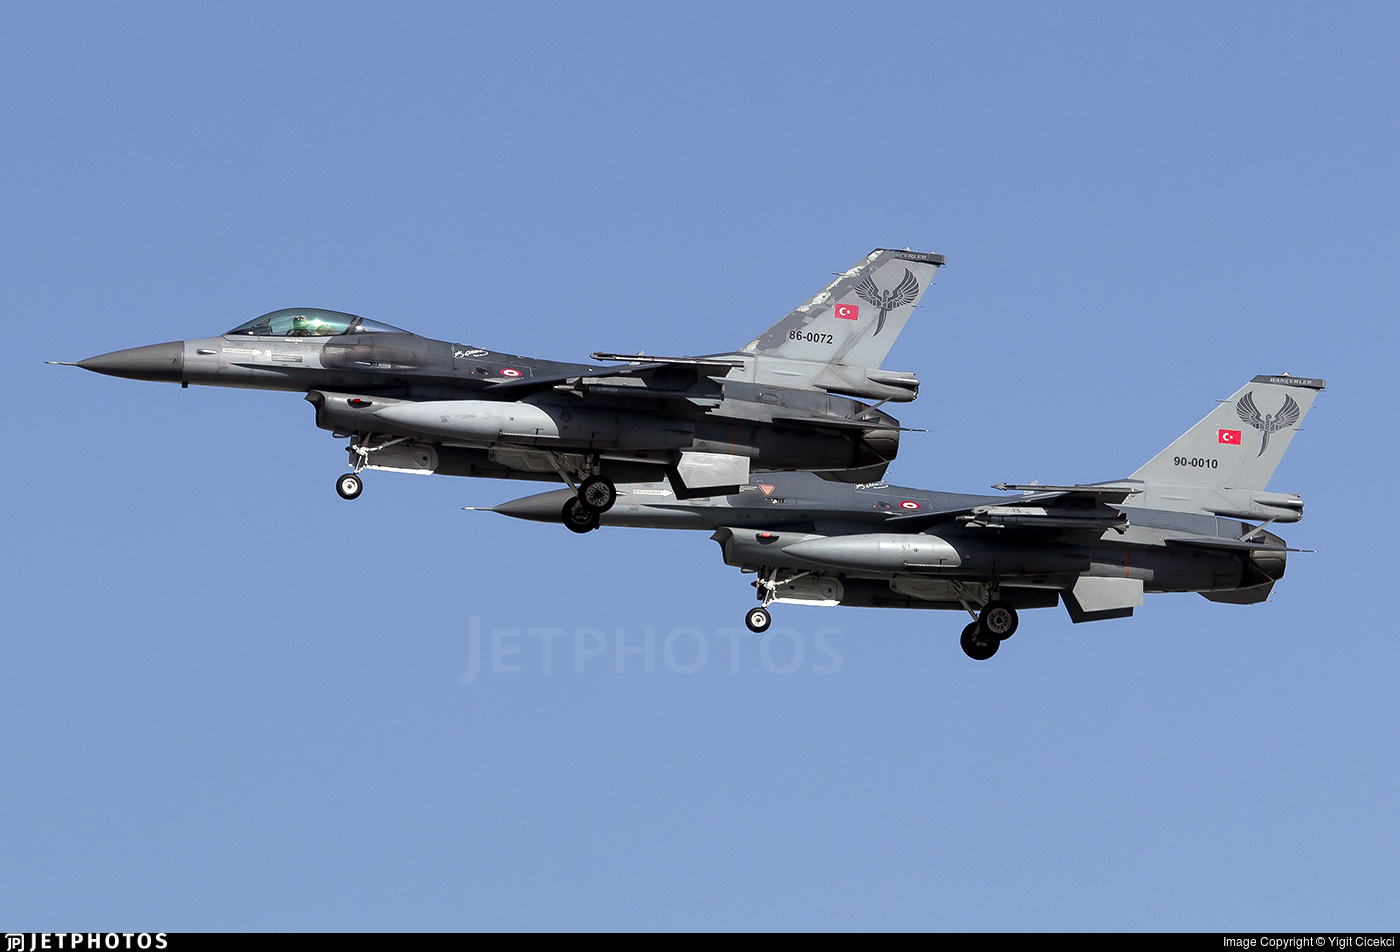 86-0072 - General Dynamics F-16C Fighting Falcon - Turkey - Air Force